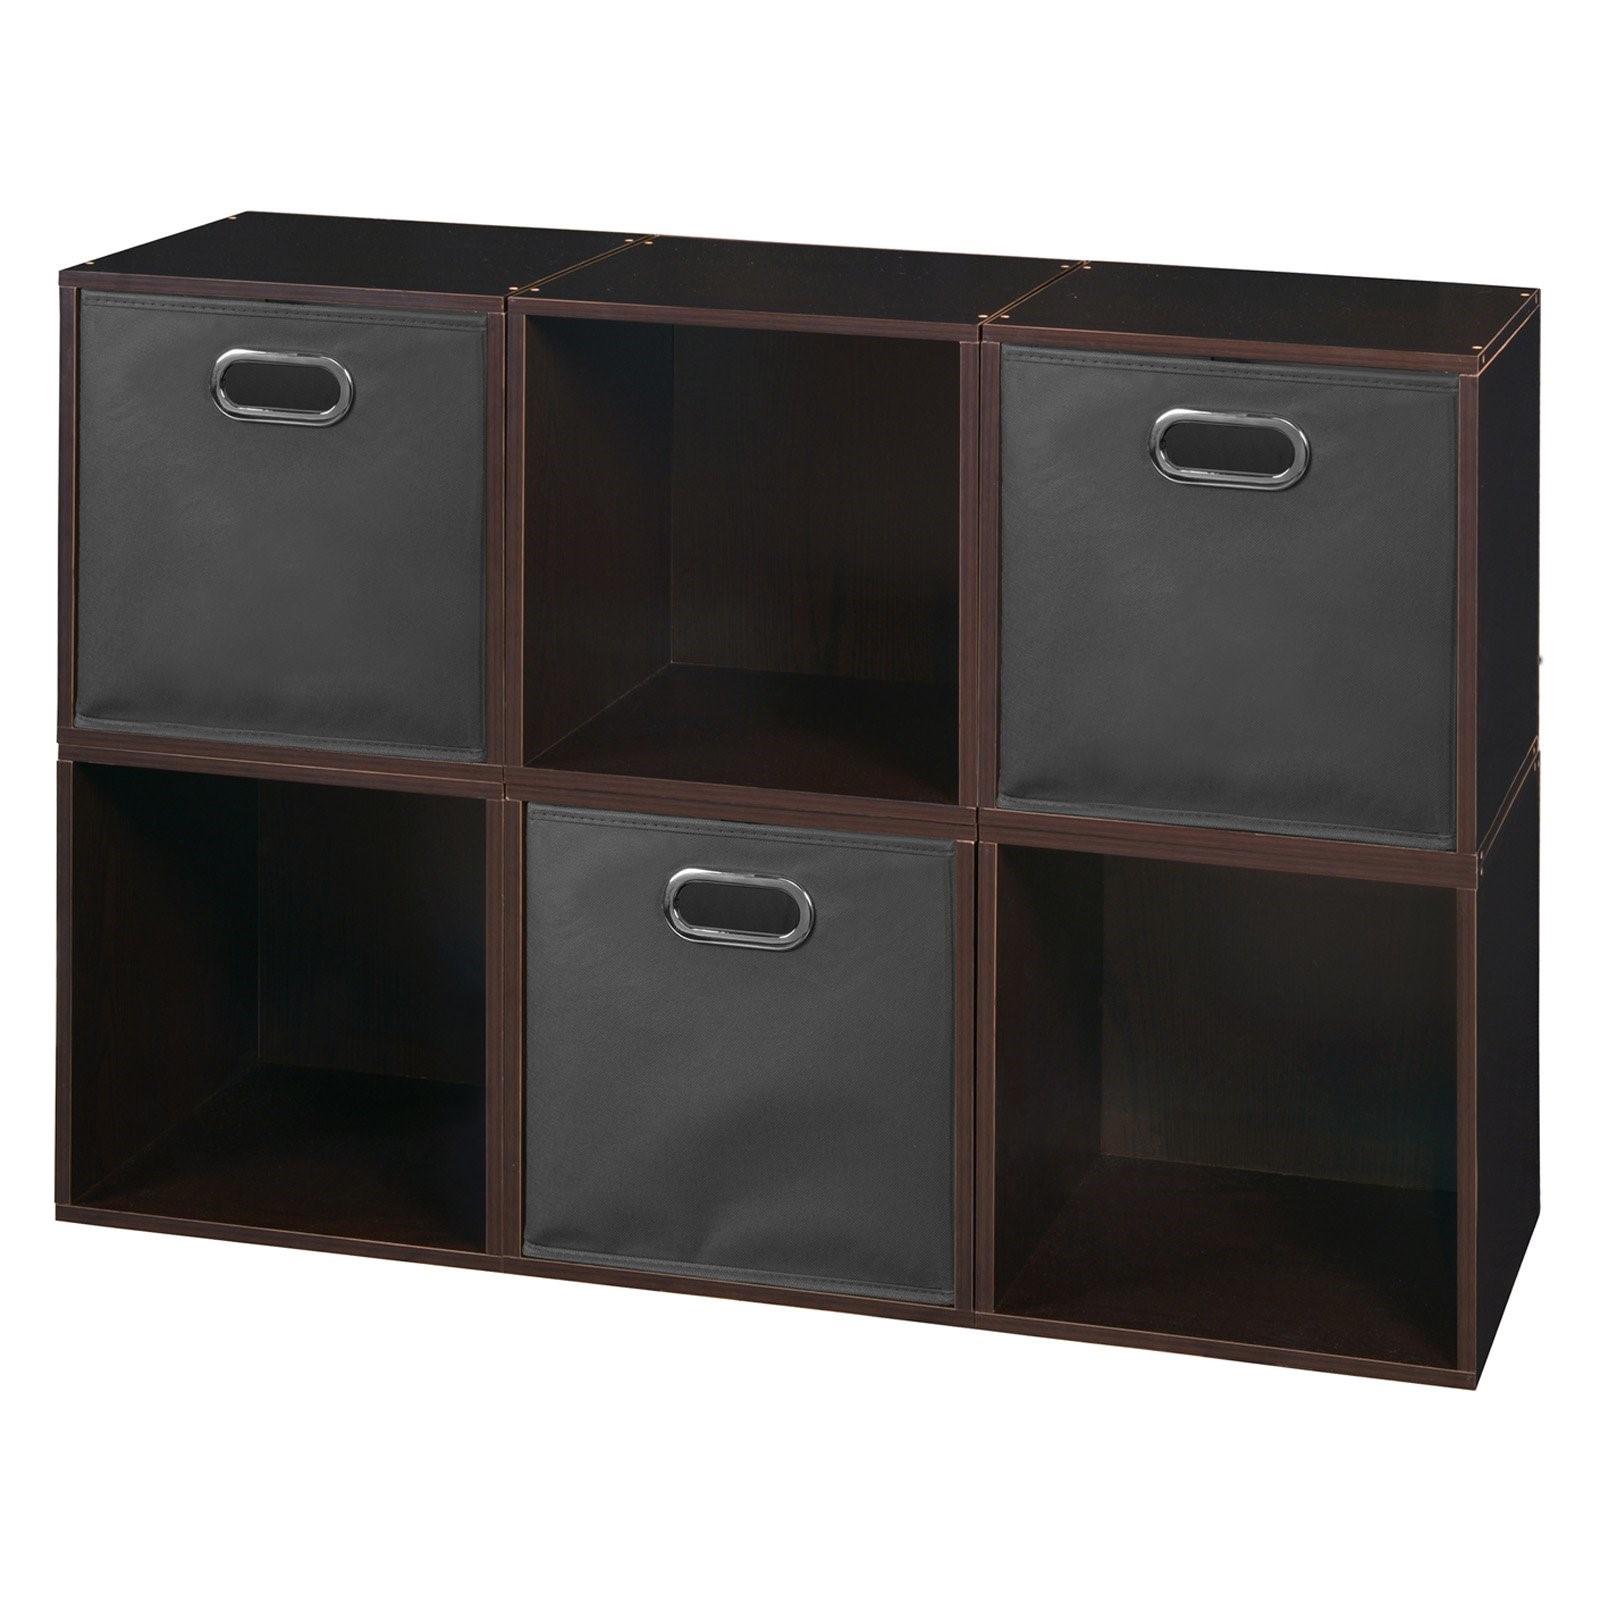 Niche Cubo Storage Set - 6 Cubes and 3 Canvas Bins